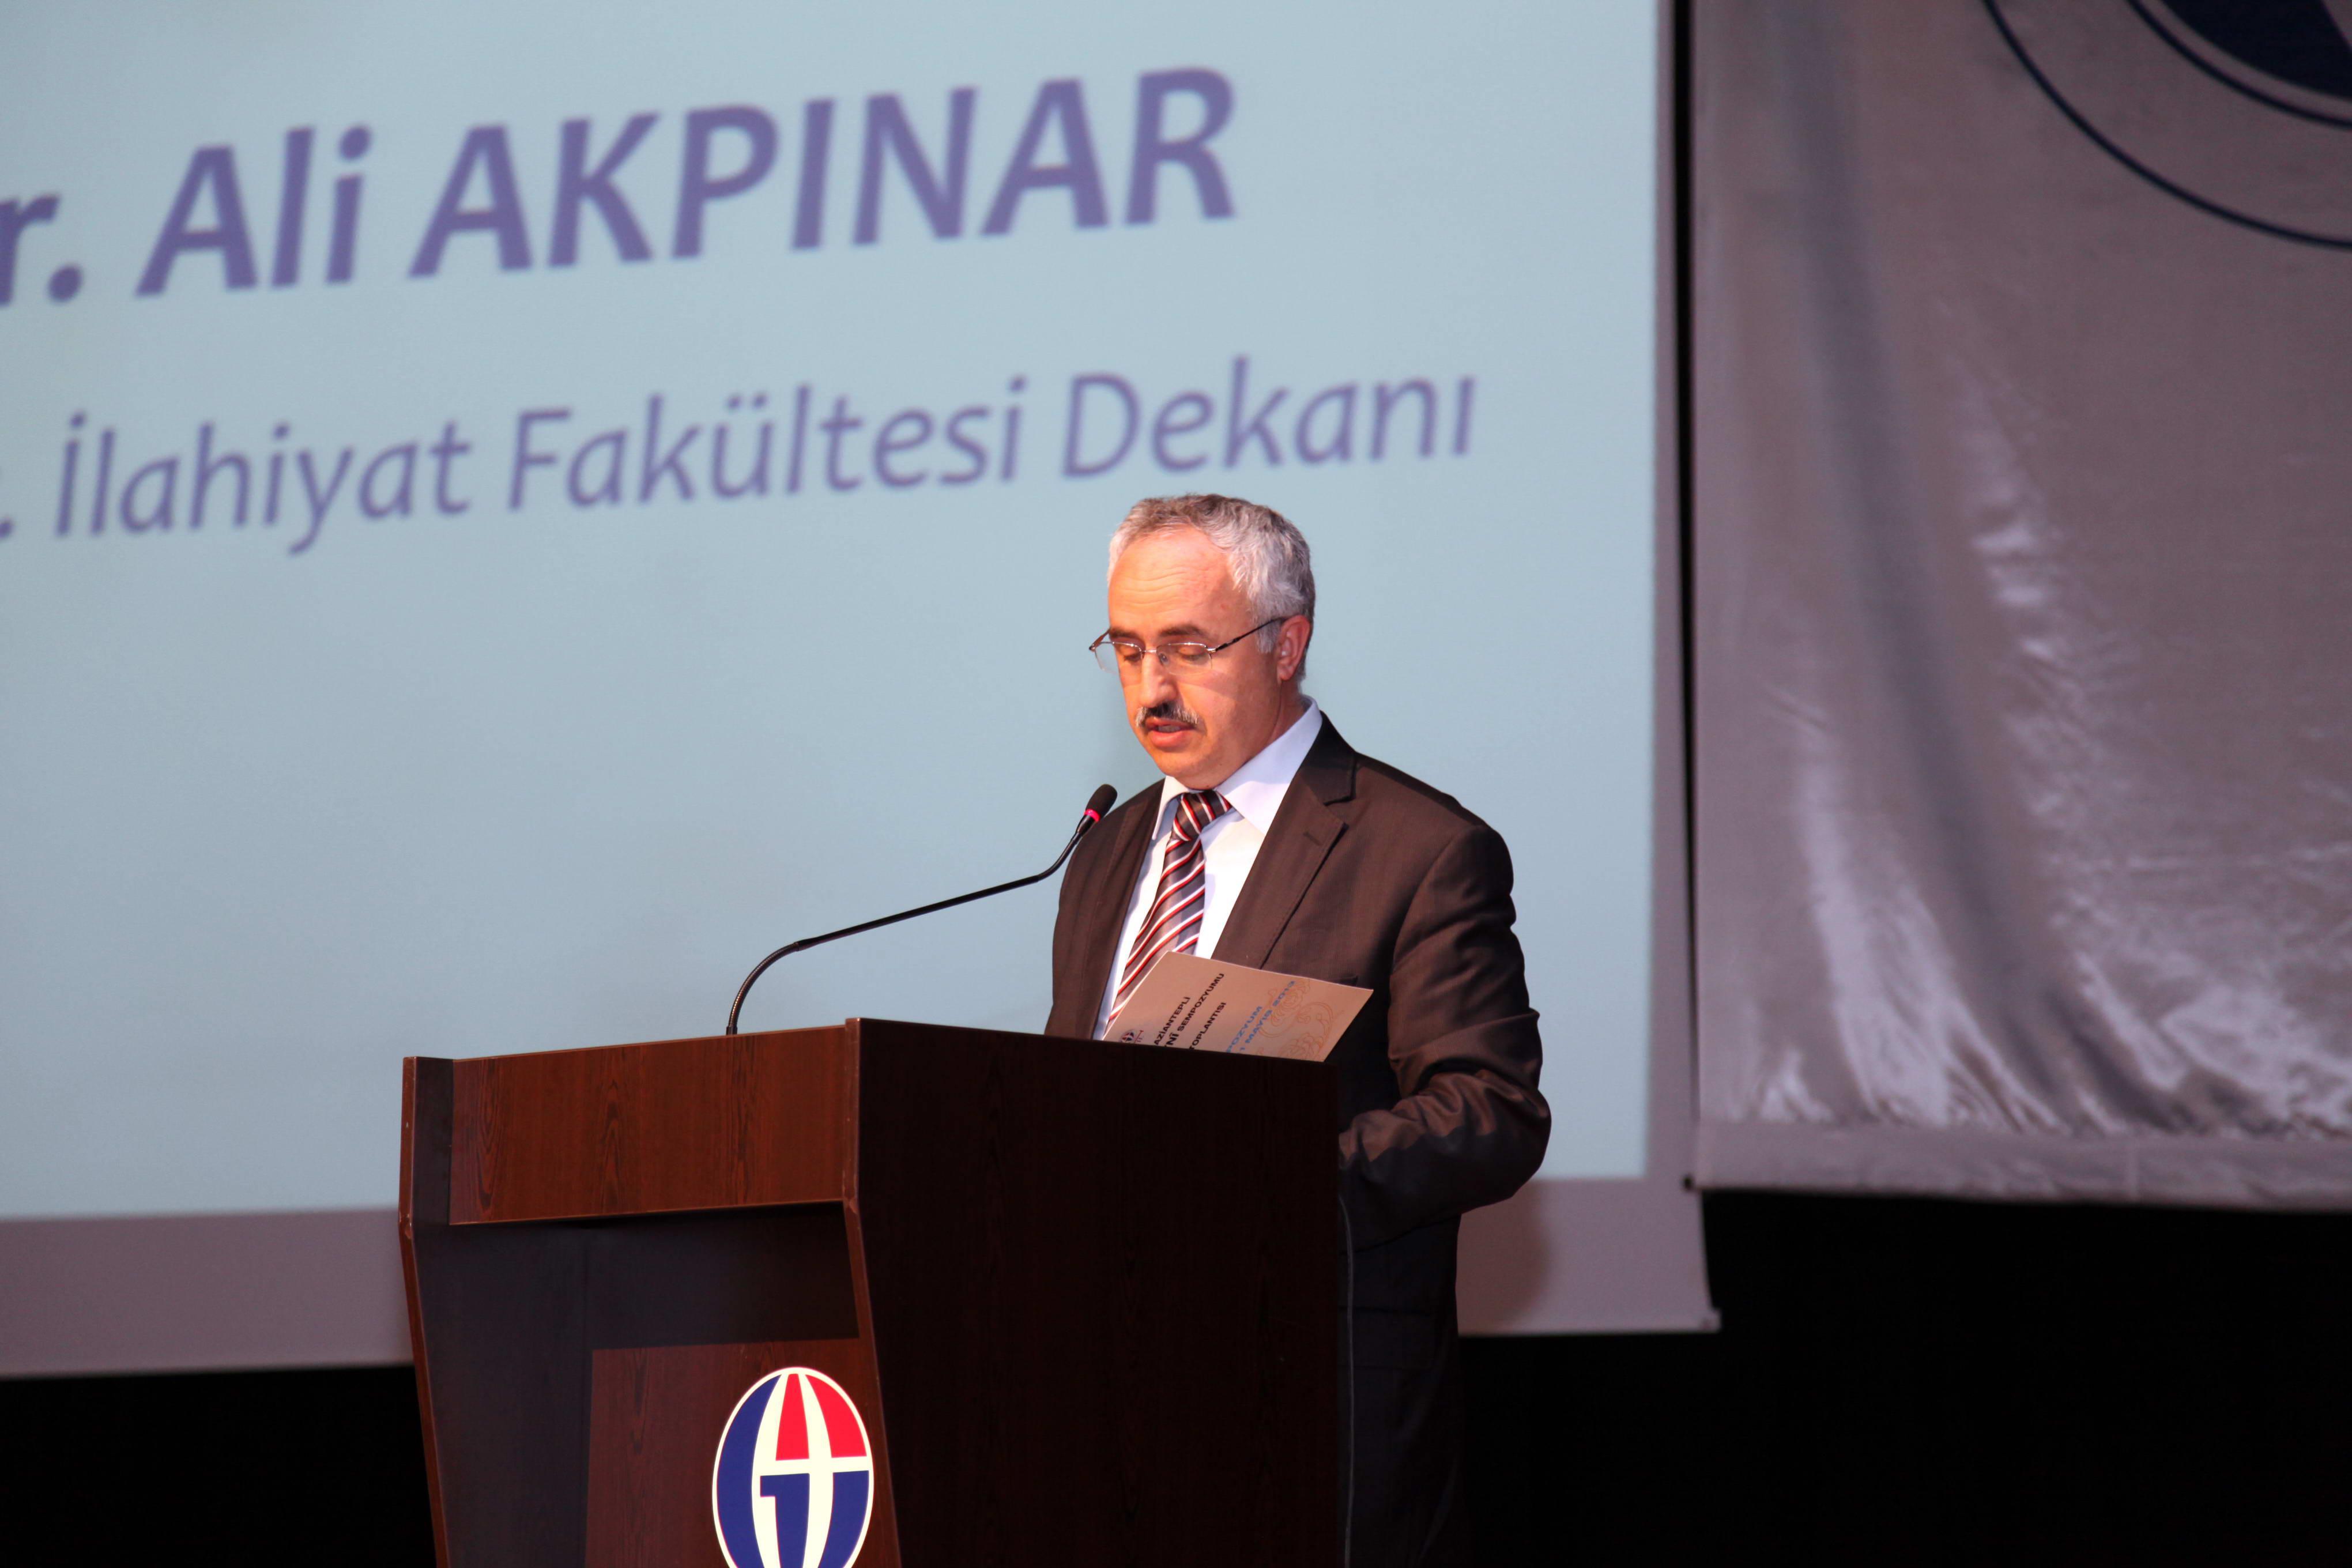 226-İLAHİYAT SEMPOZYUM (Prof. Dr. Ali Akpınar)